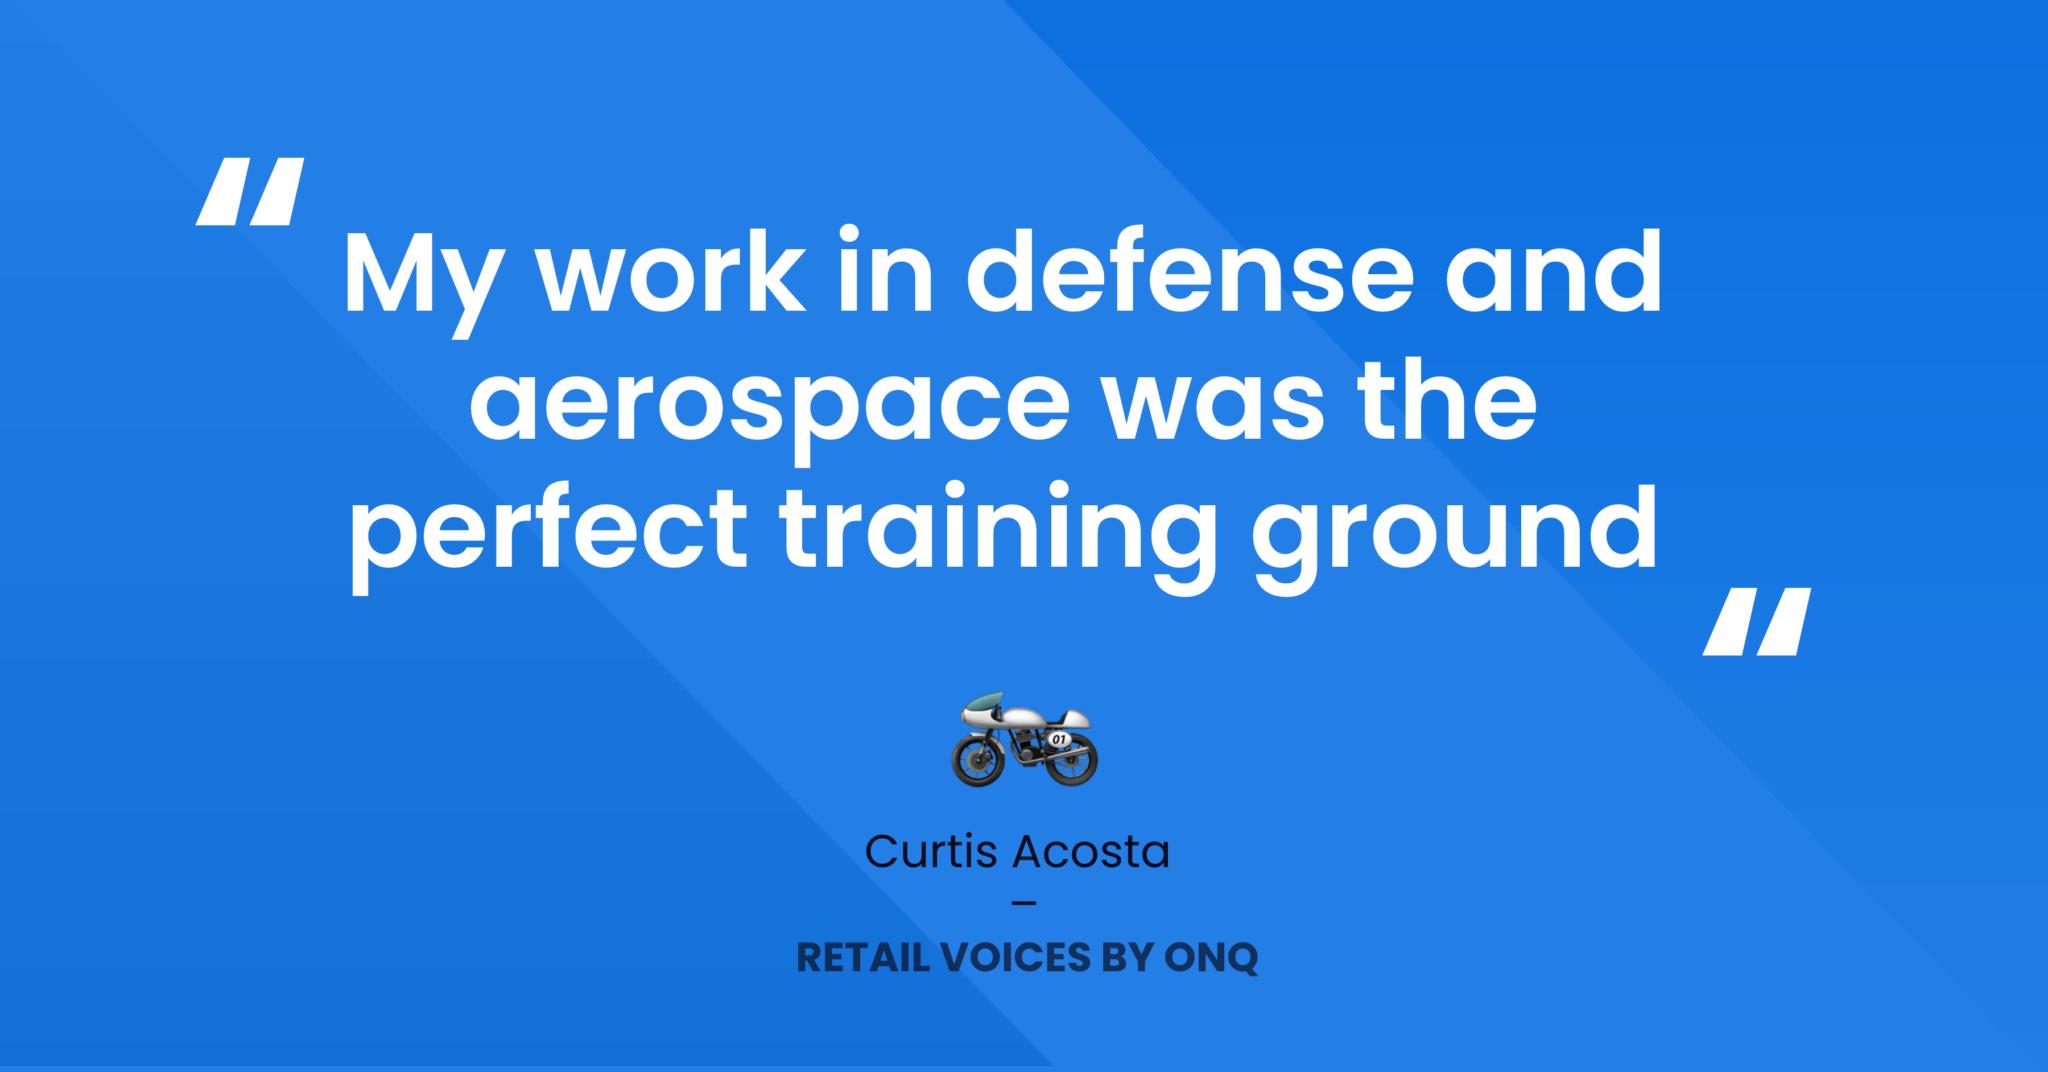 Curtis Acosta Retail Voices